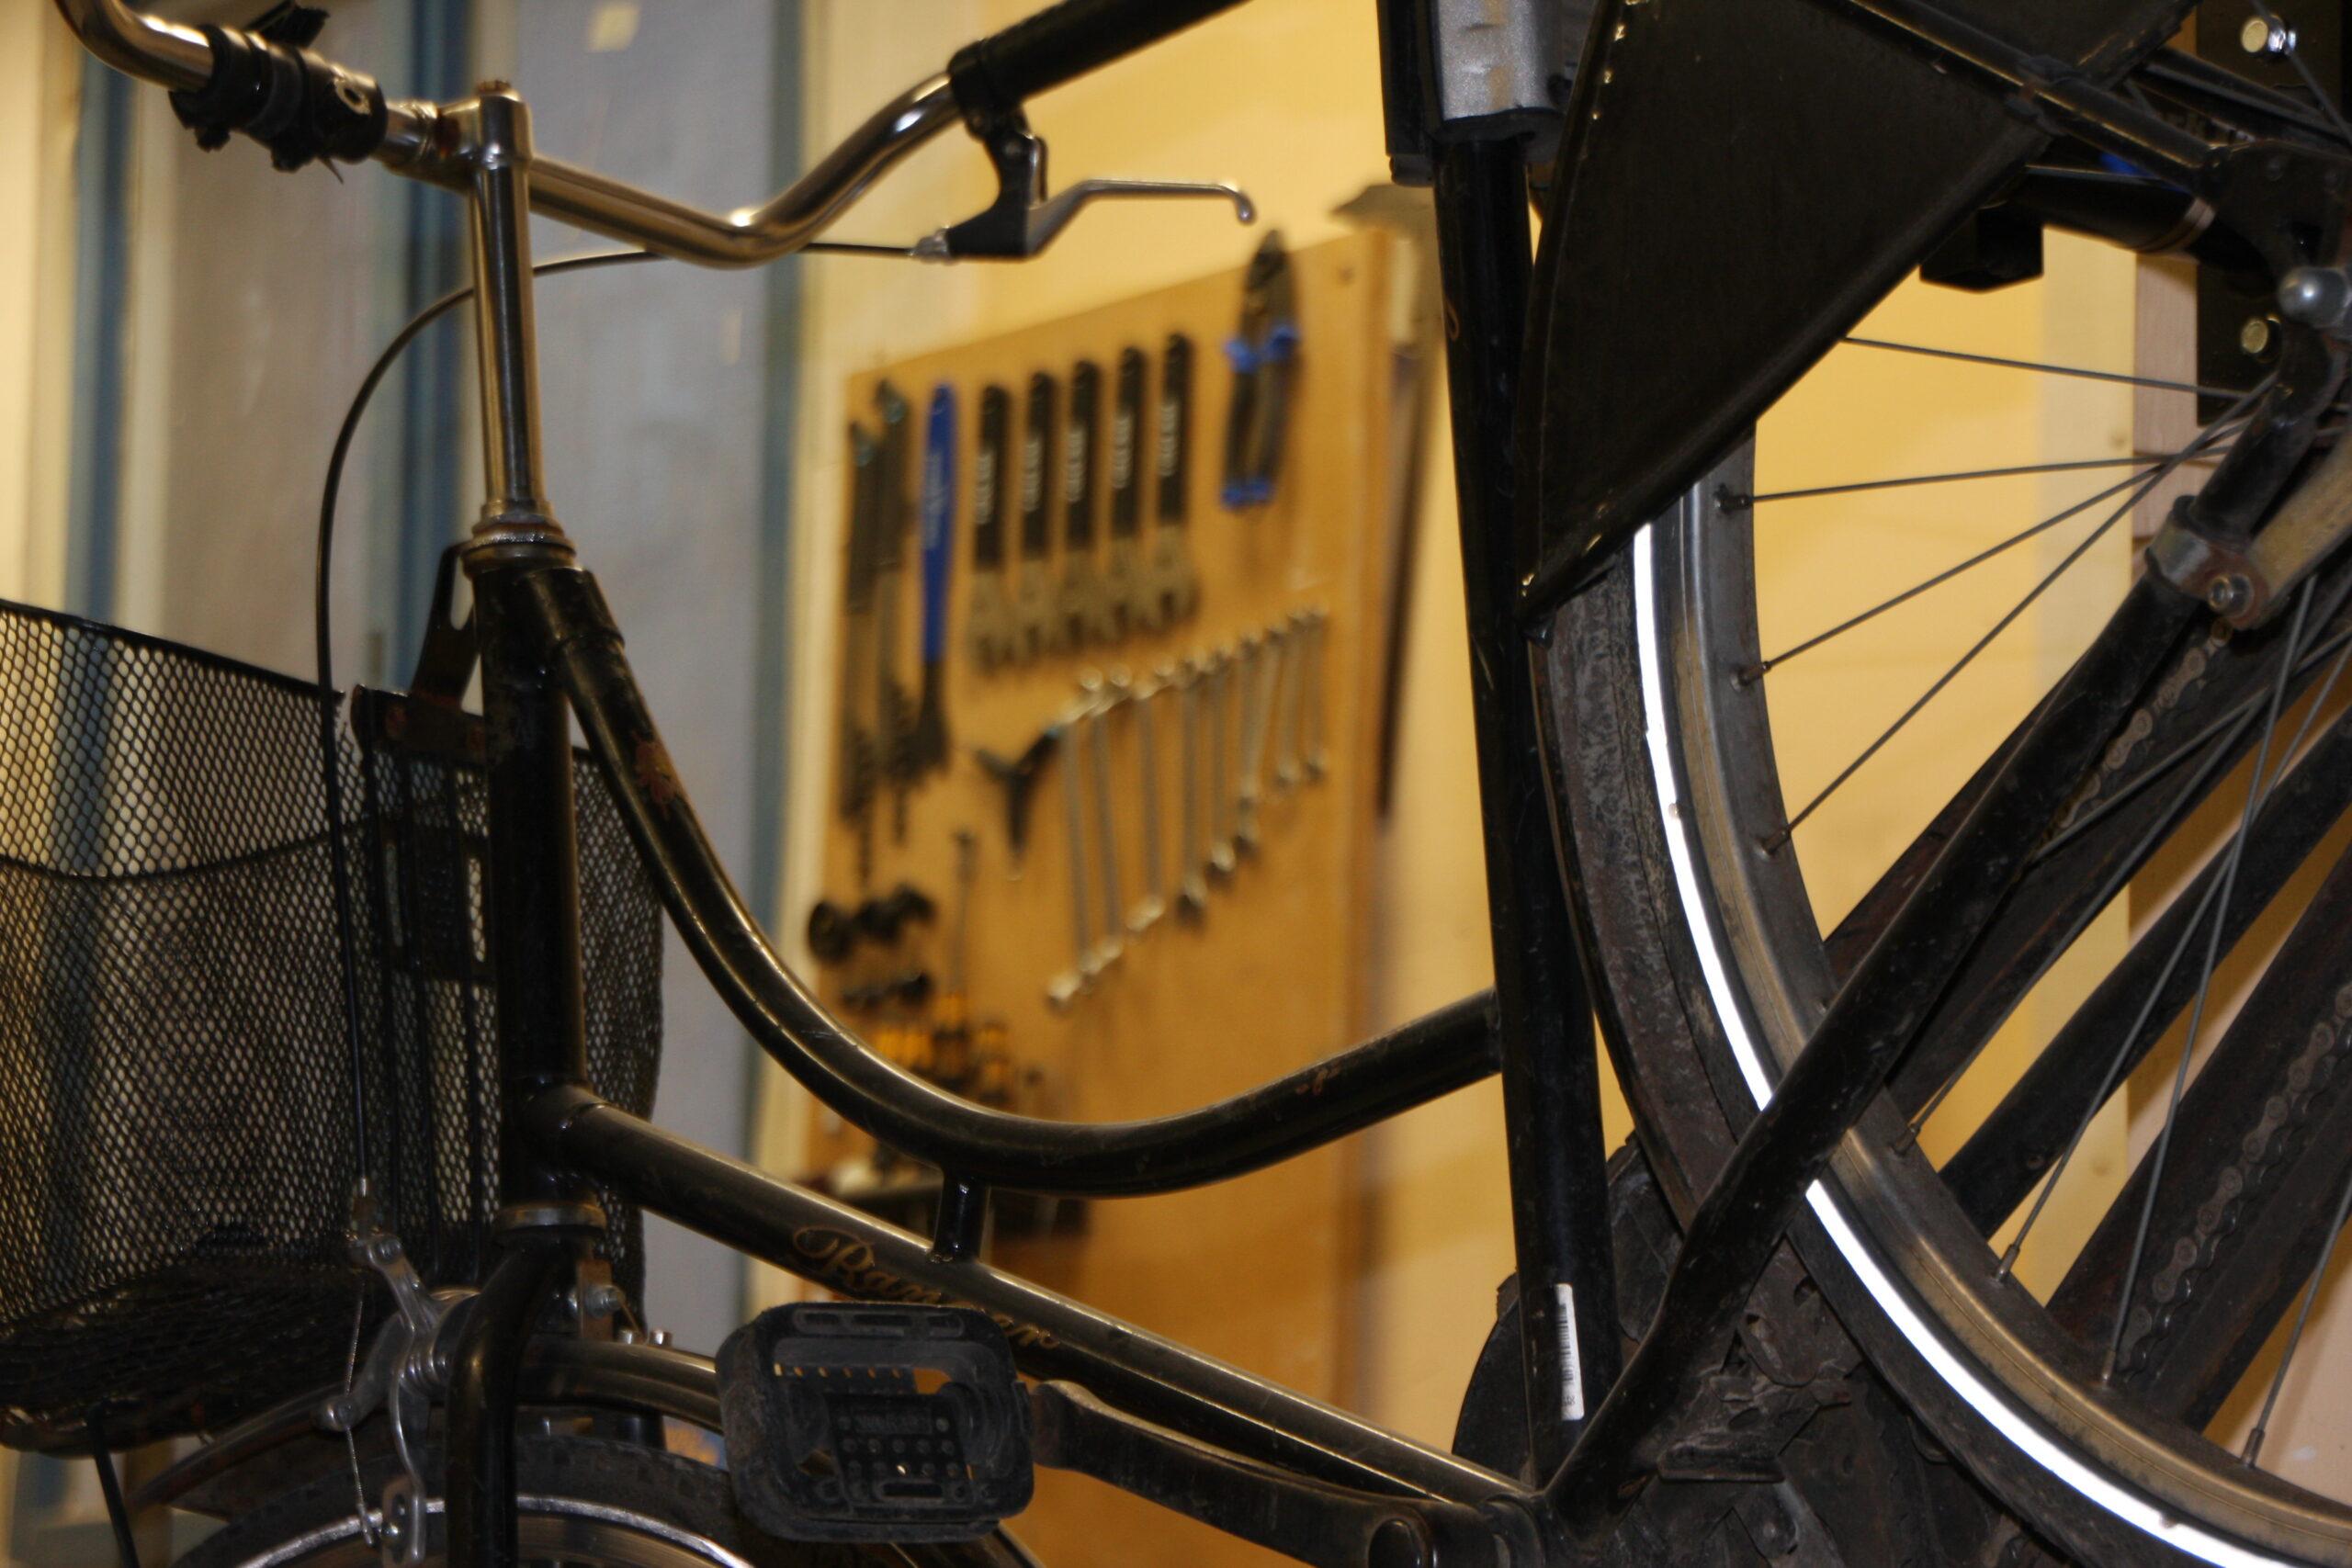 Blick in die Fahrradwerkstatt